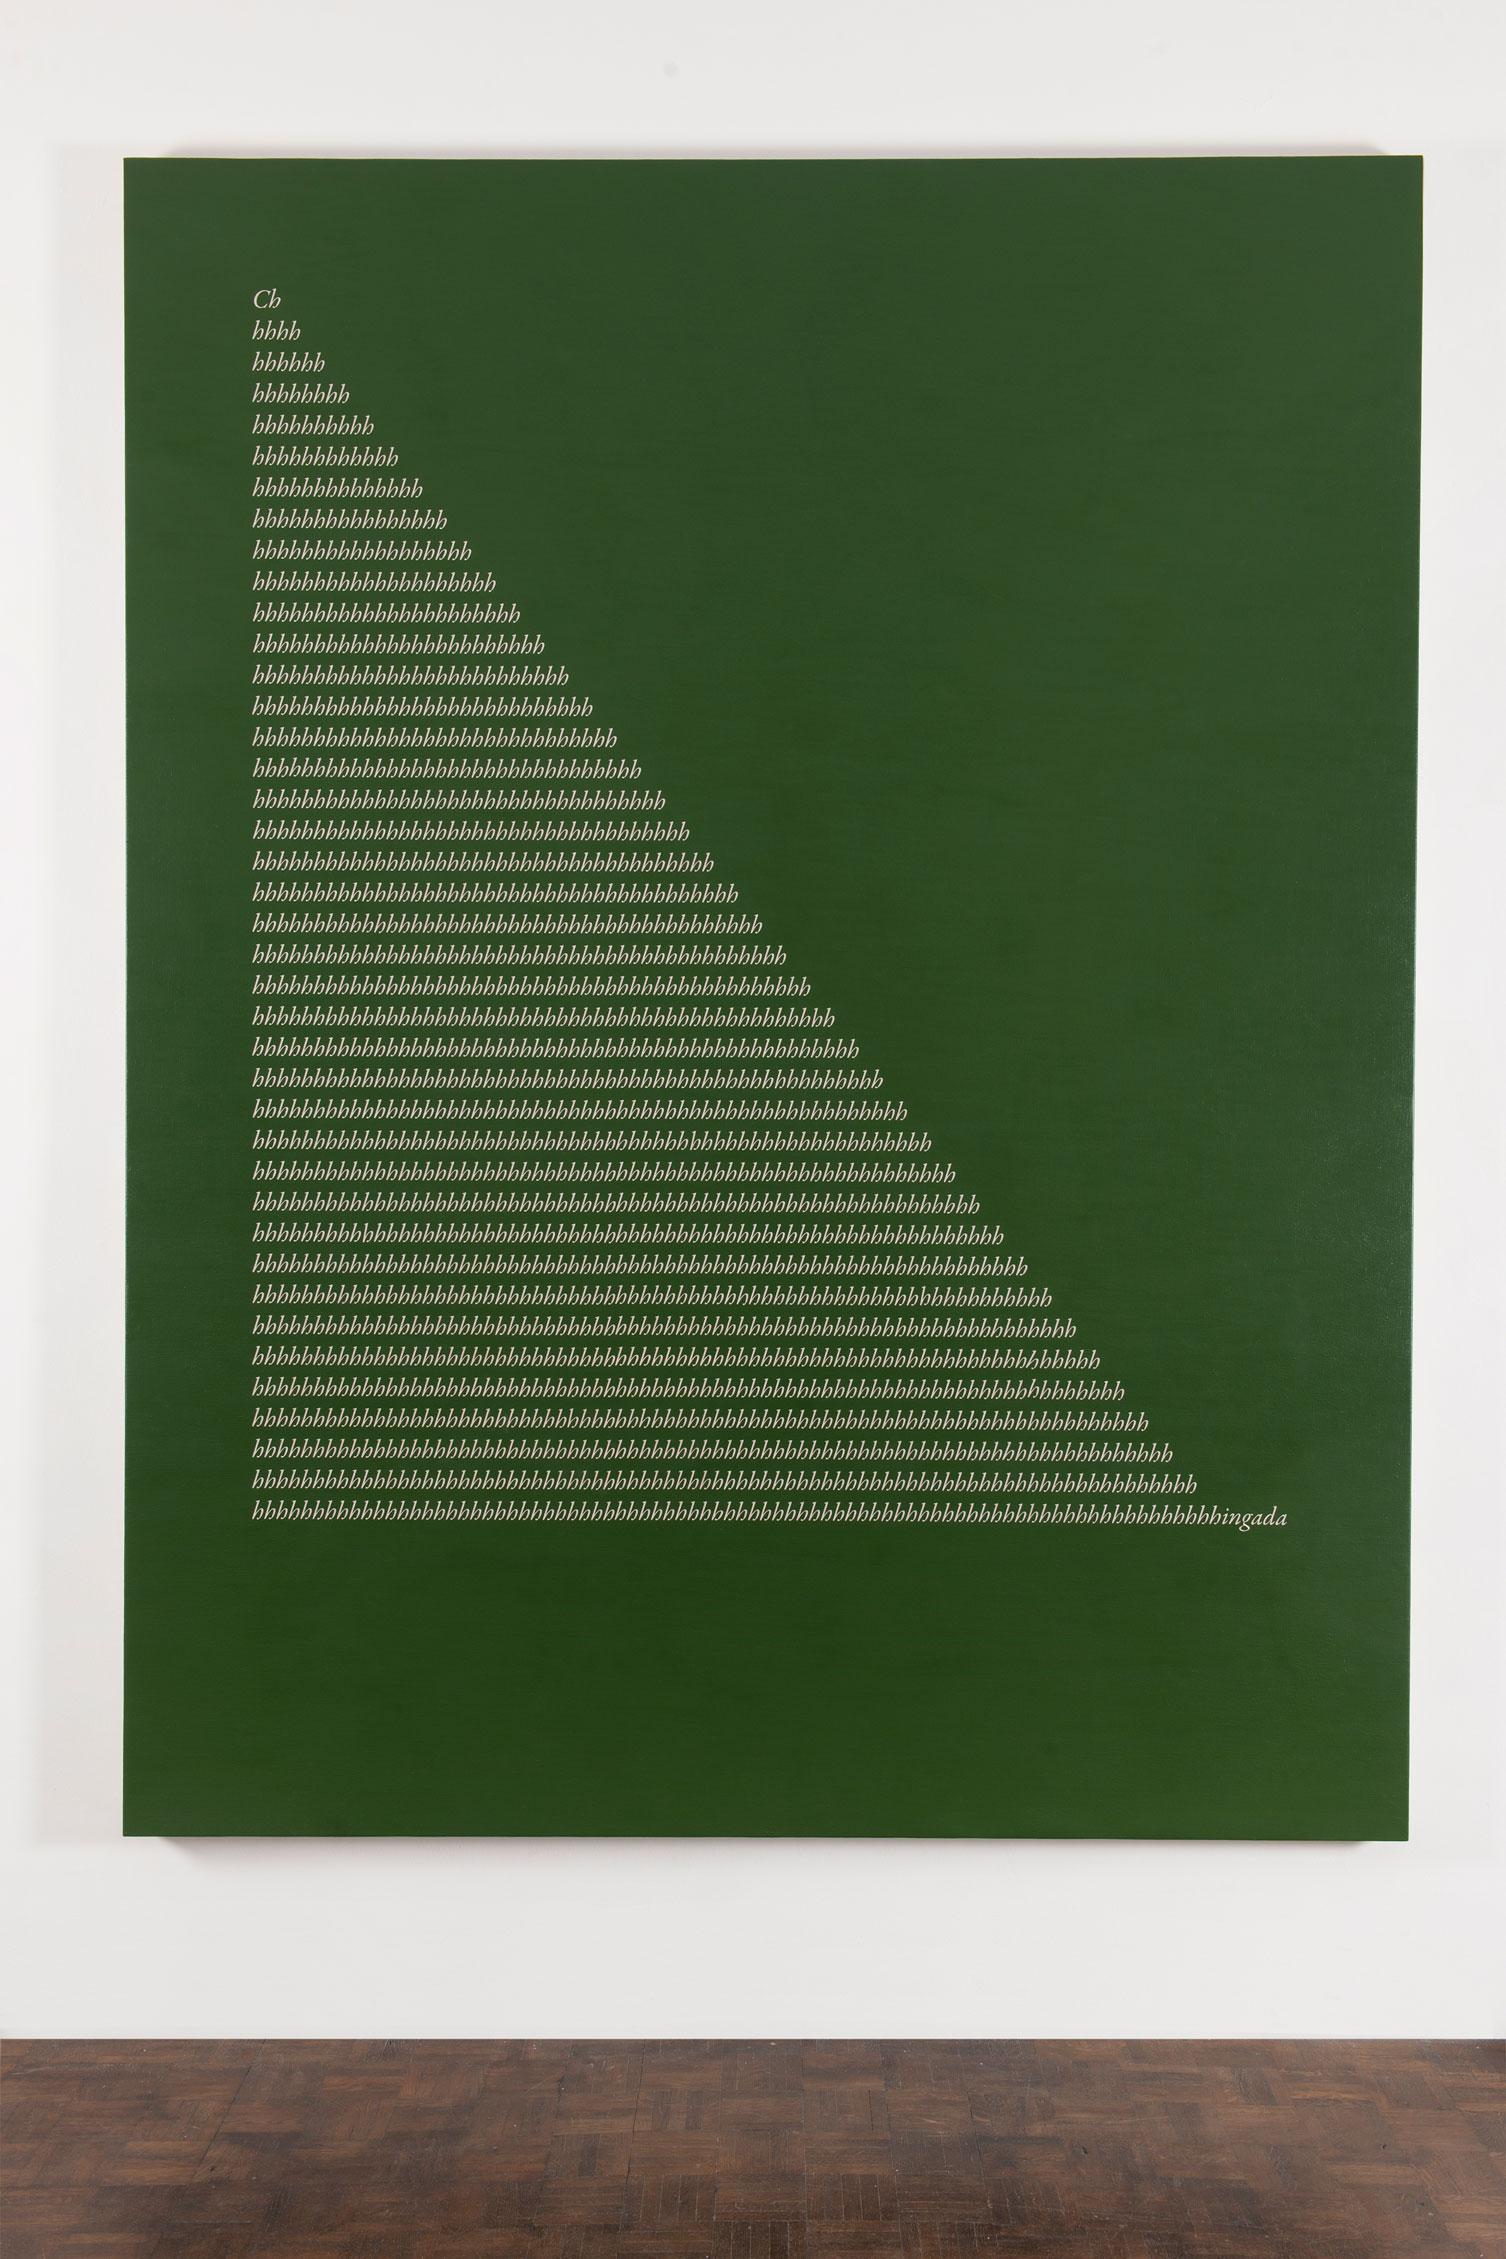 Apollinaire's Misspell I (Green)  , 2017  Acrílico sobre lino / Acrylic on linen  260 x 200 cm